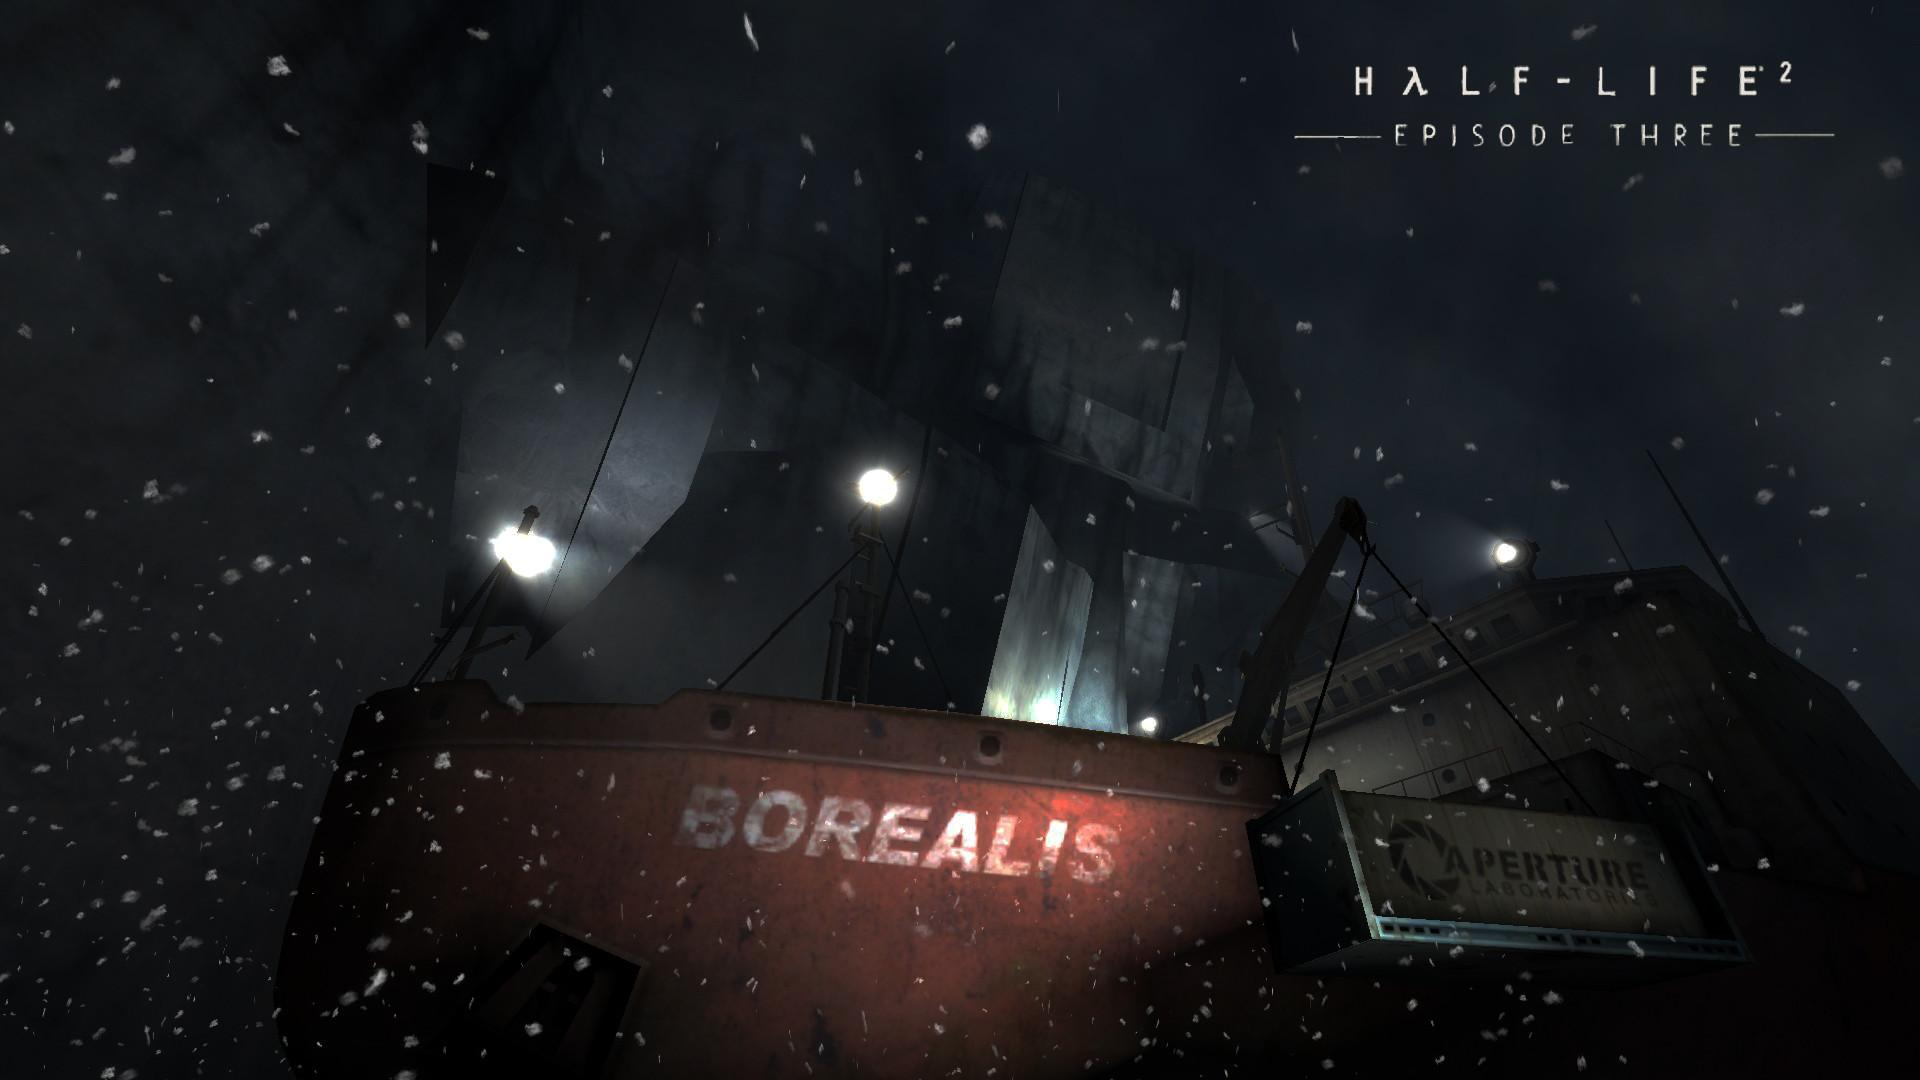 Half-Life 2 Episode Three Wallpaper